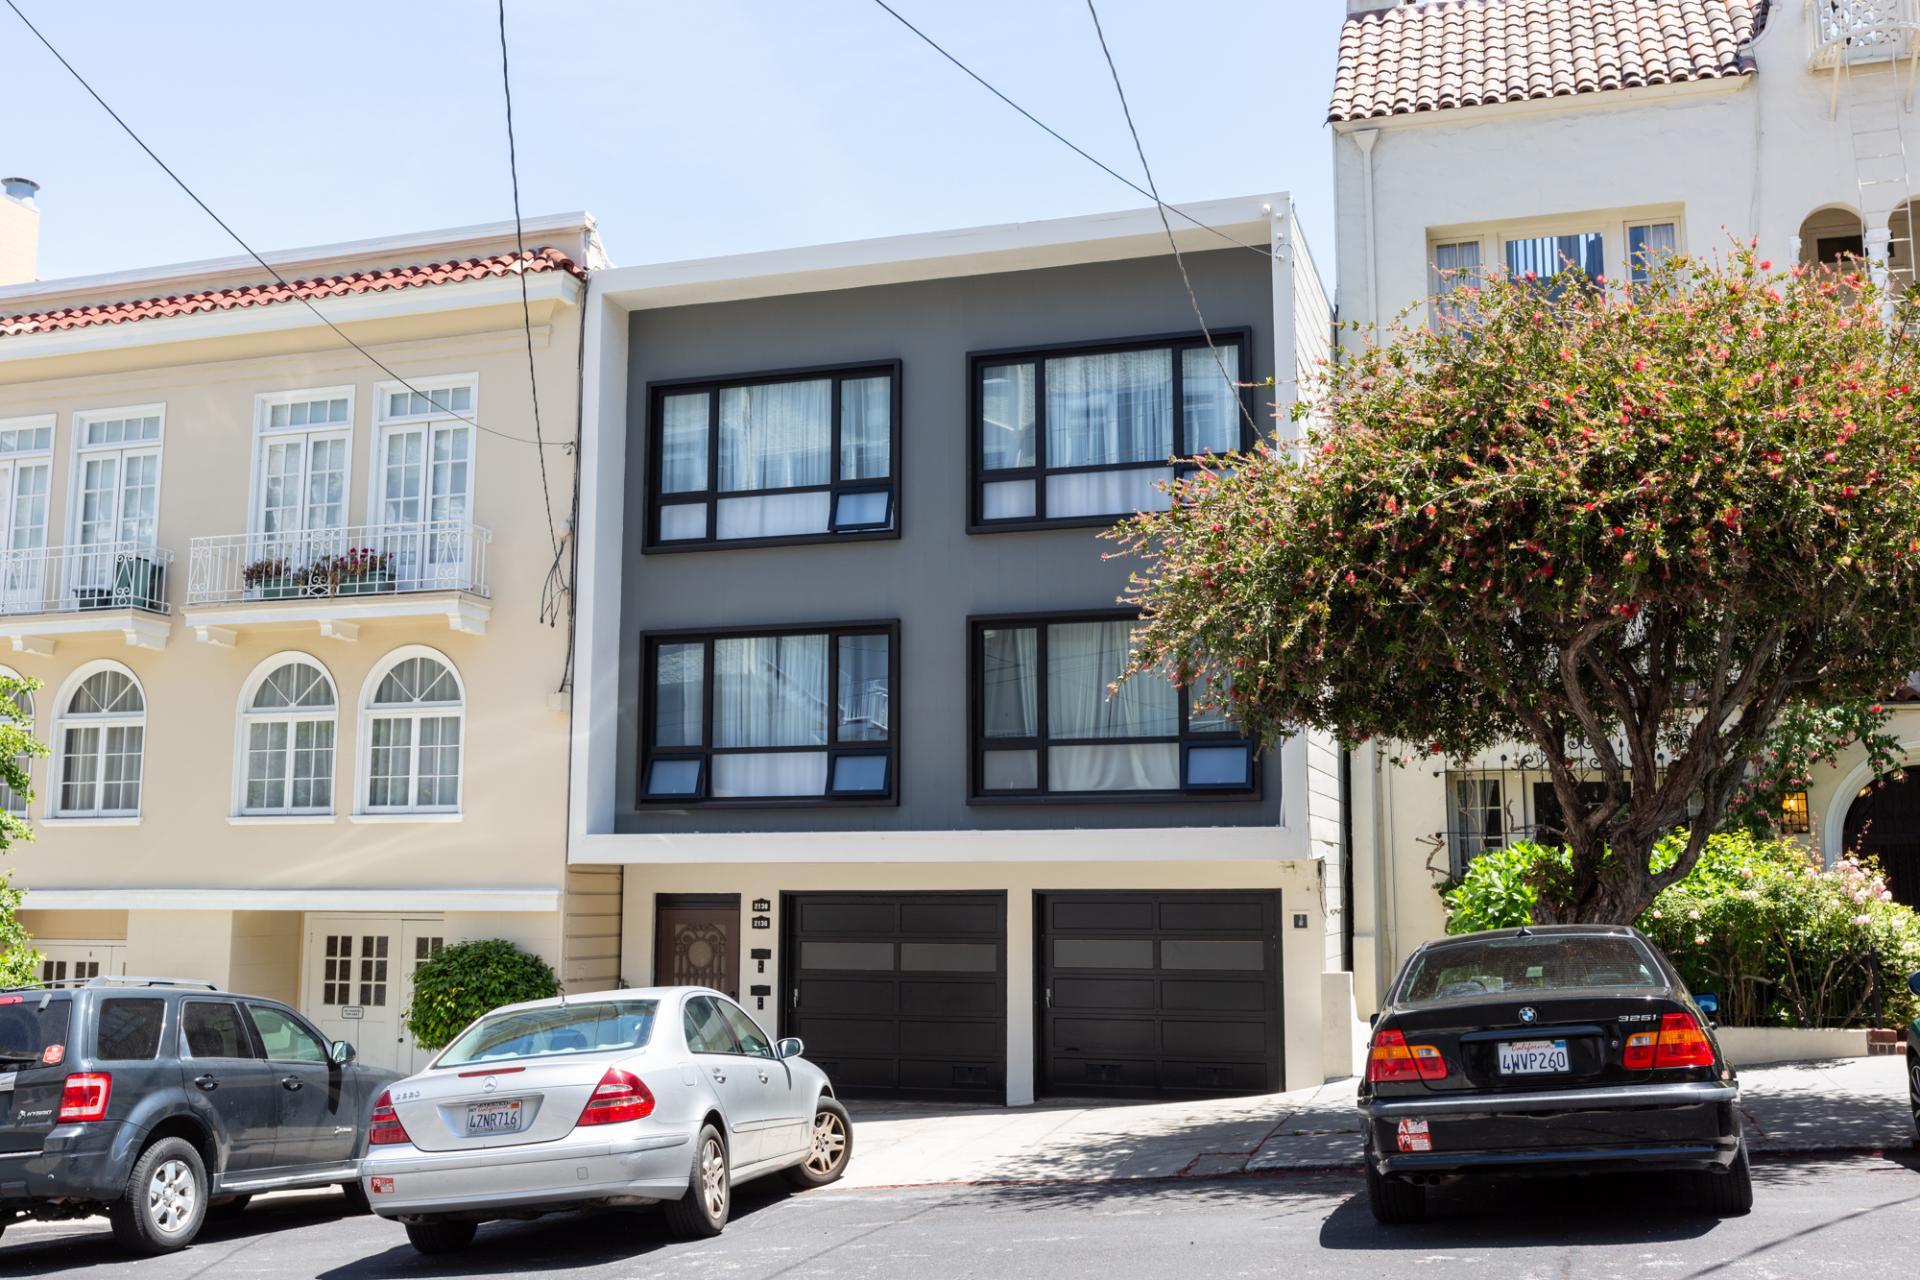 Exterior of Leavenworth Street Apartment, Russian Hill, San Francisco